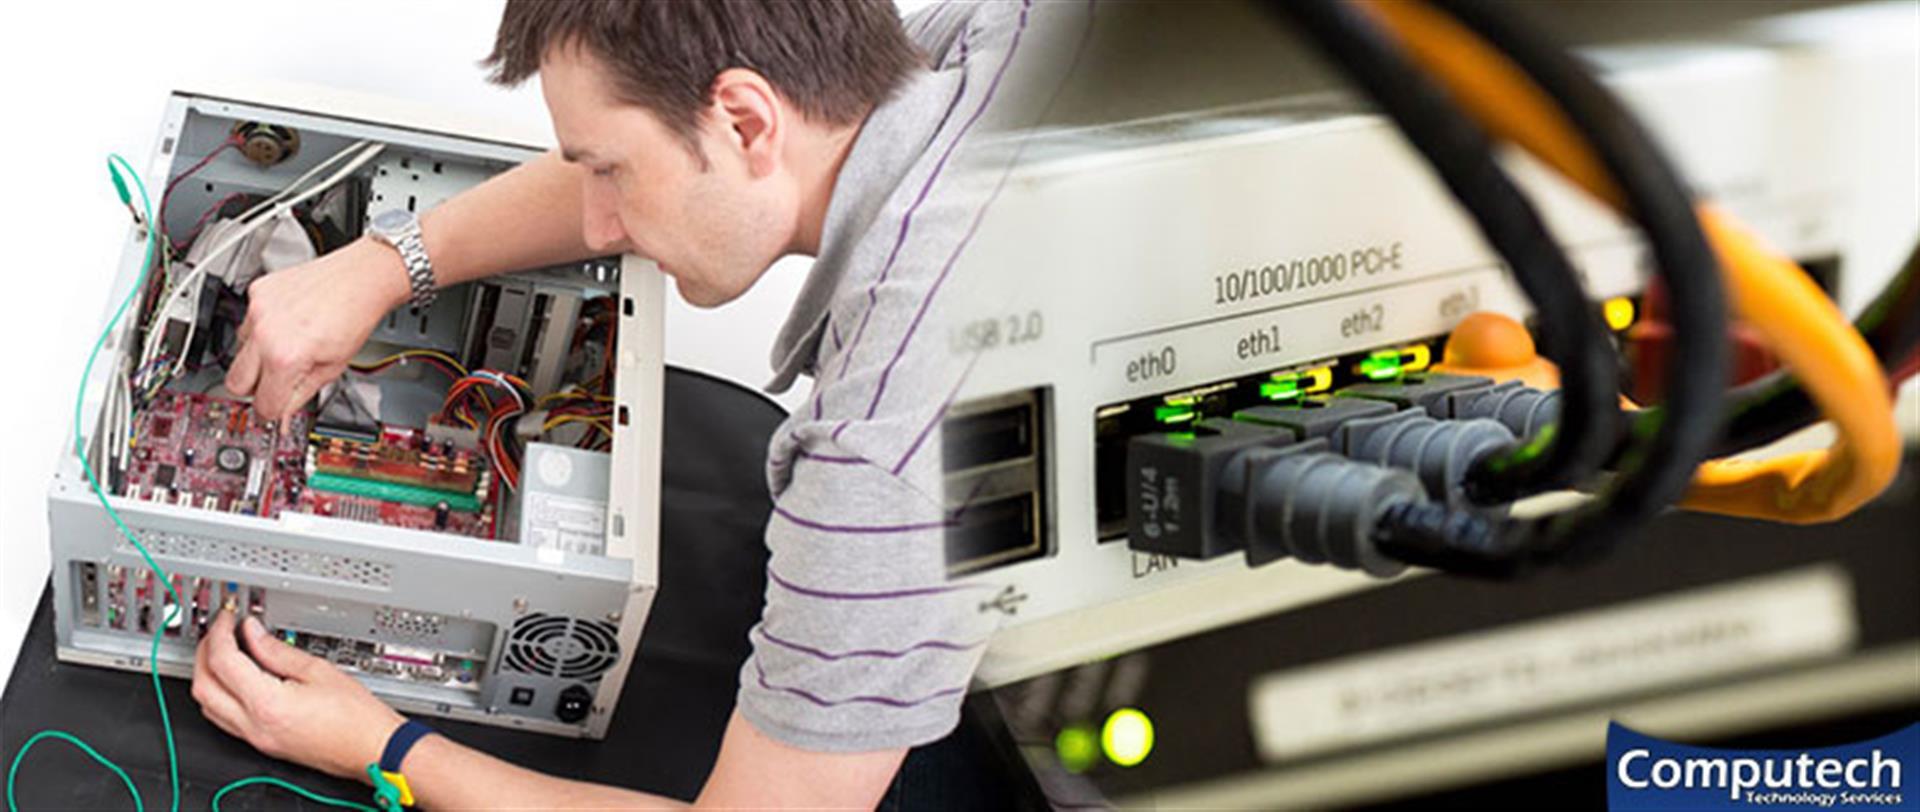 Bessemer Alabama On-Site PC & Printer Repair, Networking, Telecom & Data Wiring Services